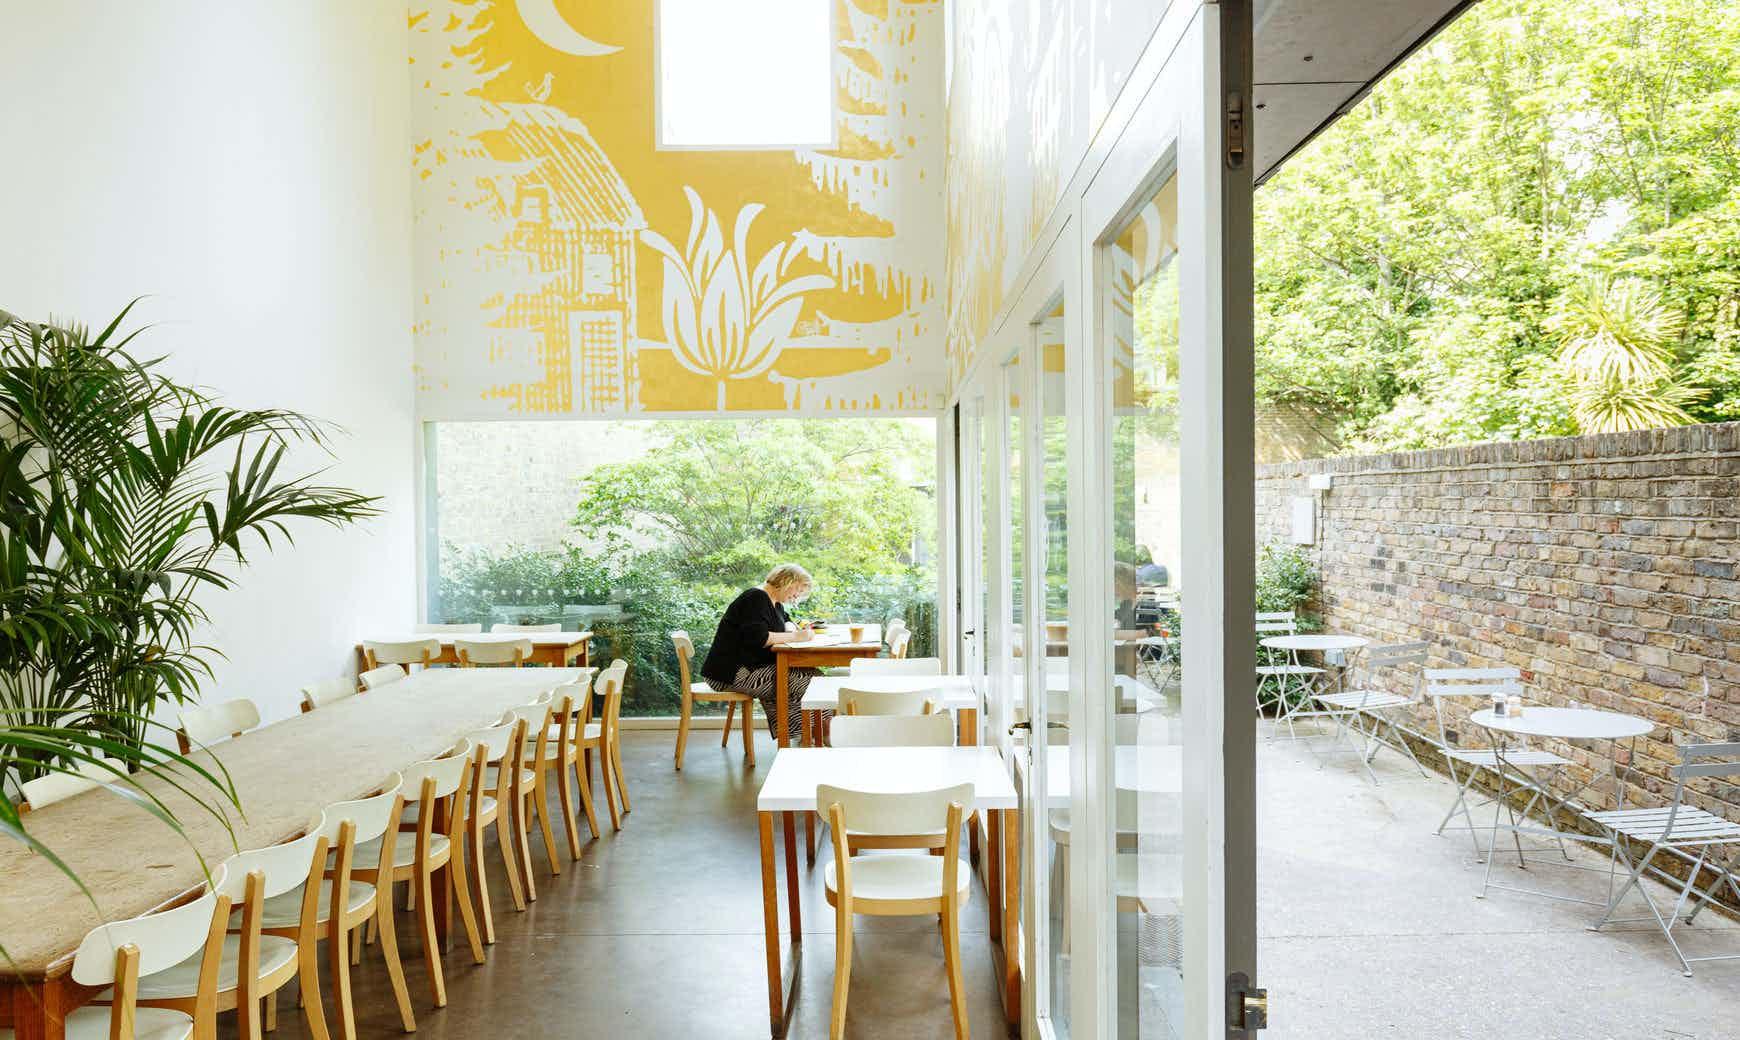 Venue Hire, Cranes Kitchen